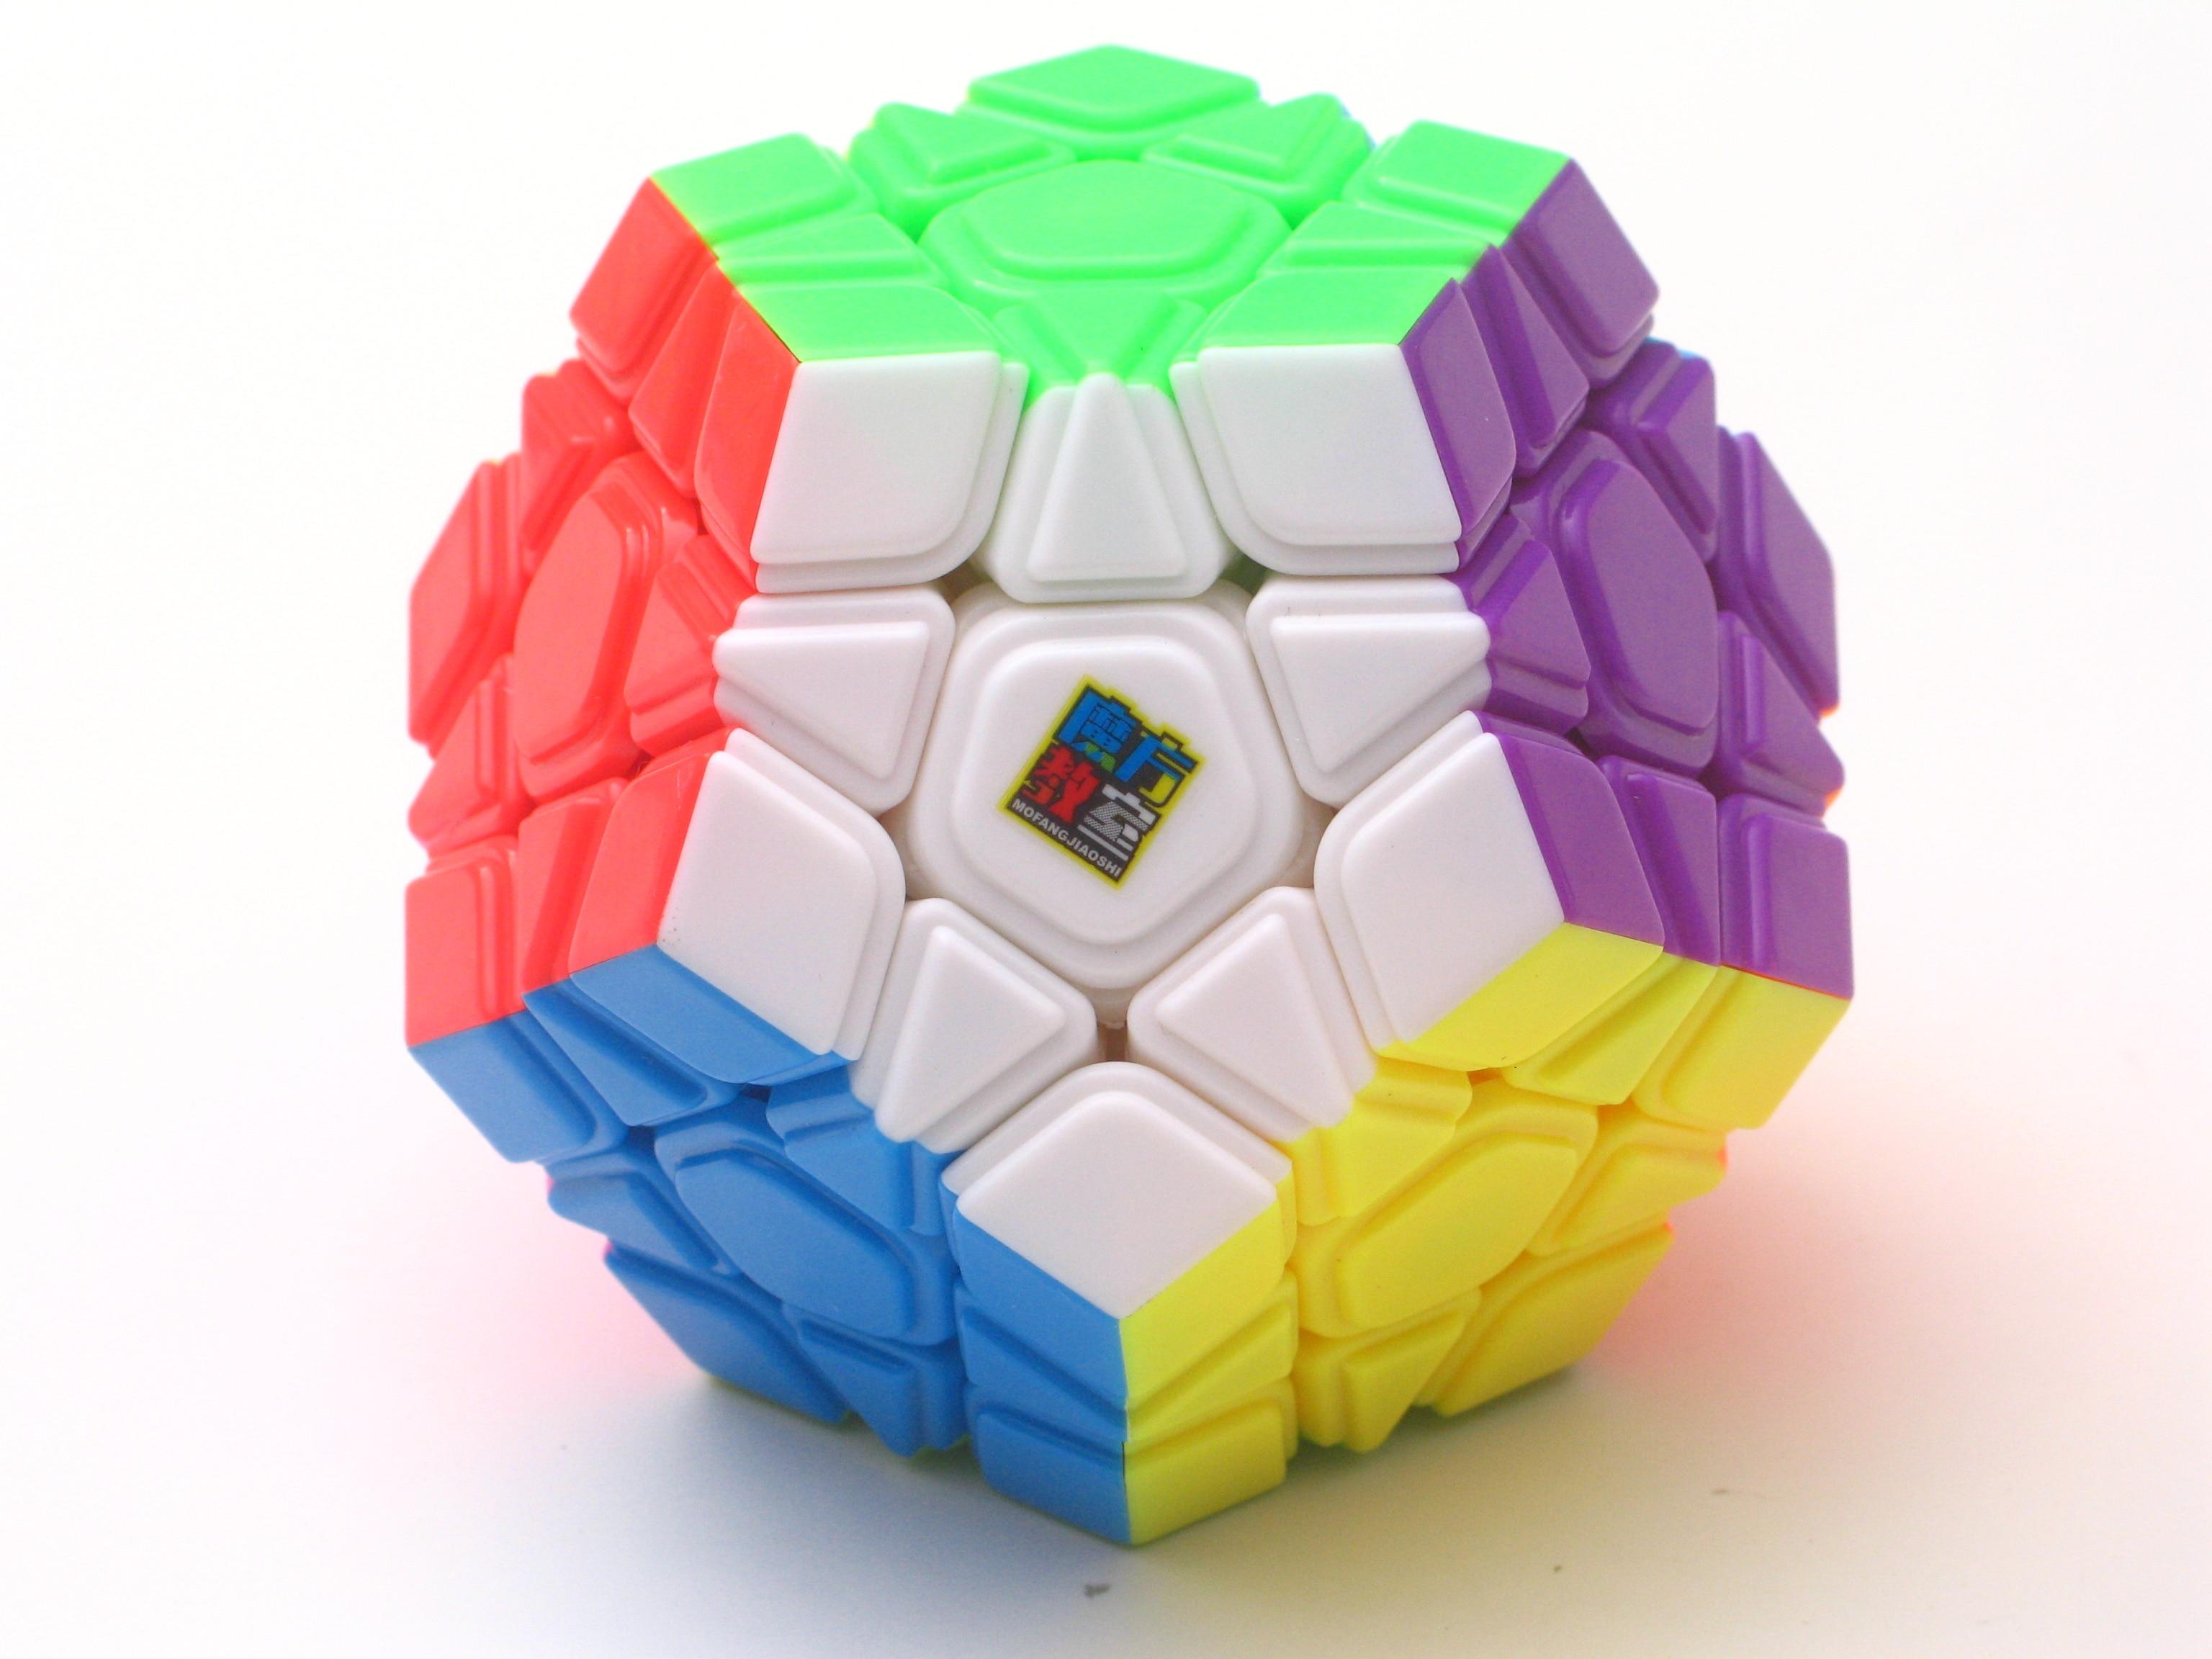 Original Moyu Mofangjiaoshi 3x3 Wumofang Meilong Stickerless Magic Cube Puzzle Cubo Magico Convex Professional Educational Toys